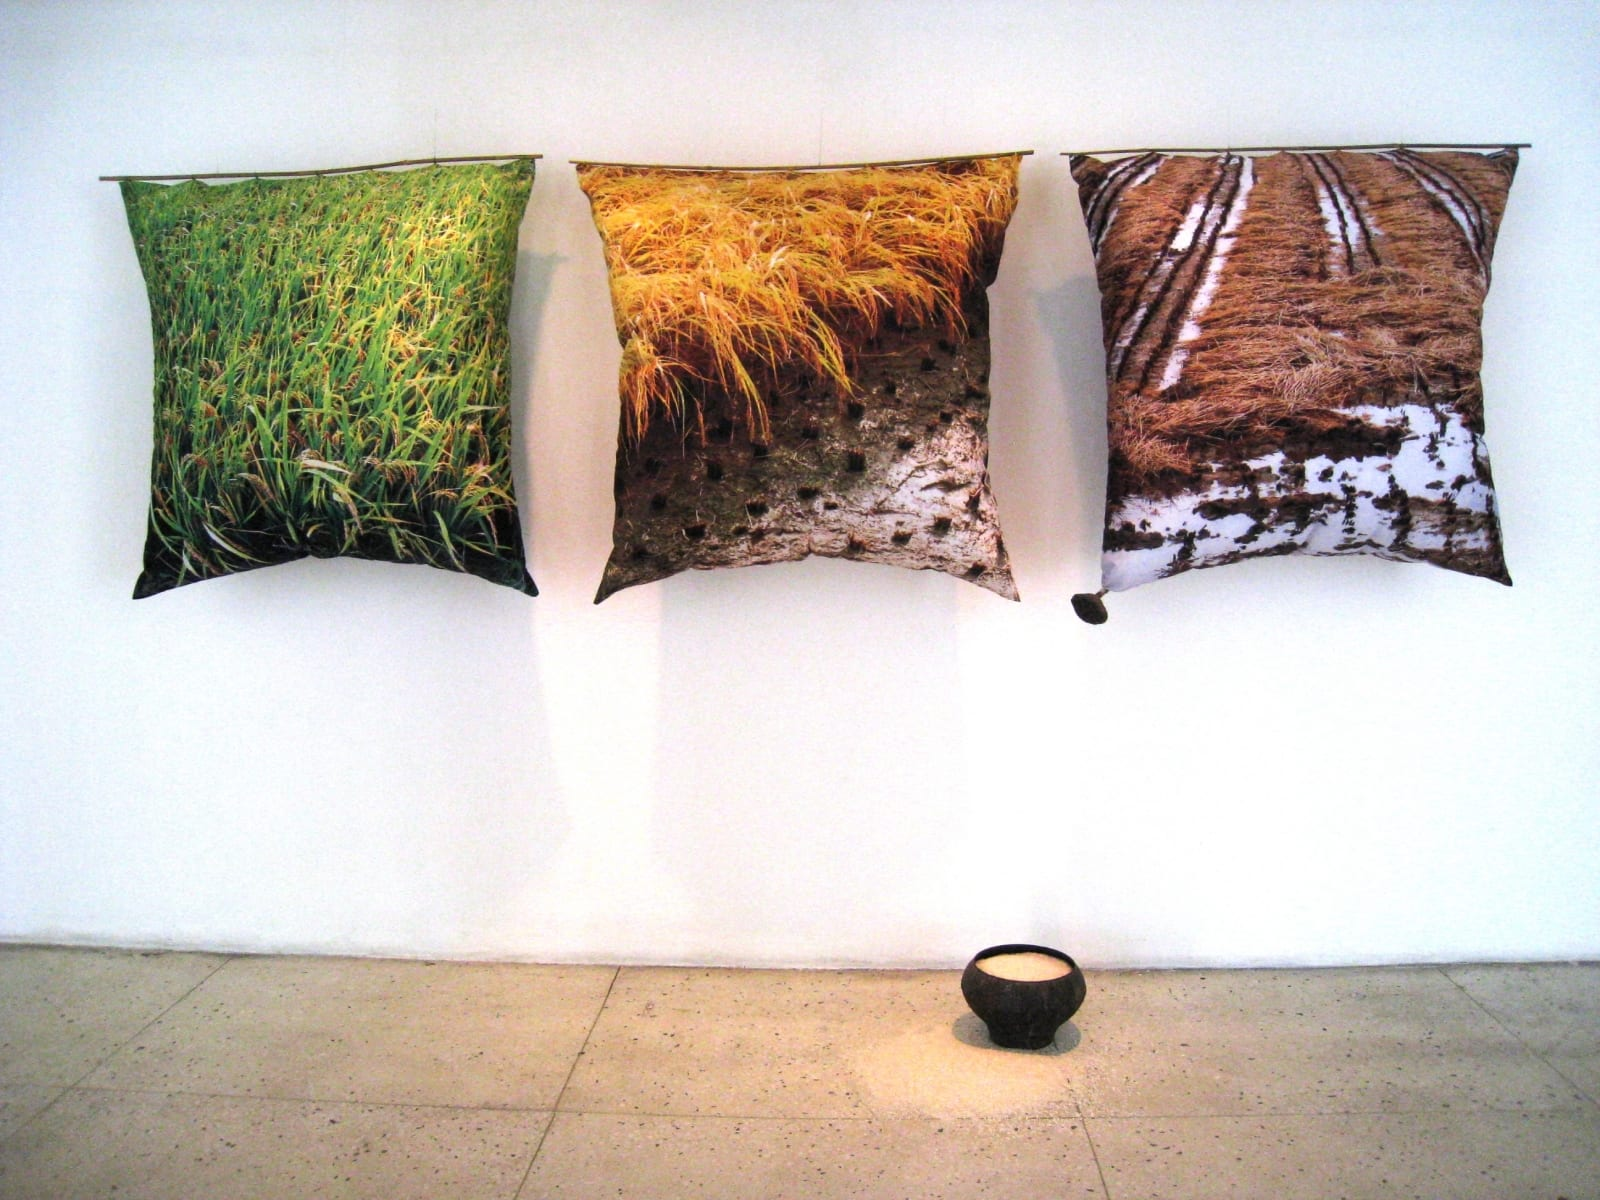 """HOMMAGE EMAKESELE RIISILE"" installatsioon 2011  3 patja mõõdus 1m x1mx 30cm kangale trükitud Korea riisipõldude fotod,padjatäidis,bambuspulk,riis,metall<br/> ""HOMMAGE to MOTHER RICE"" installation 2011  3 pillows measures 1mx1mx30cm photos of rice fields in South Korea printed on cancas, pillowfill,bamboo,rice,metal"